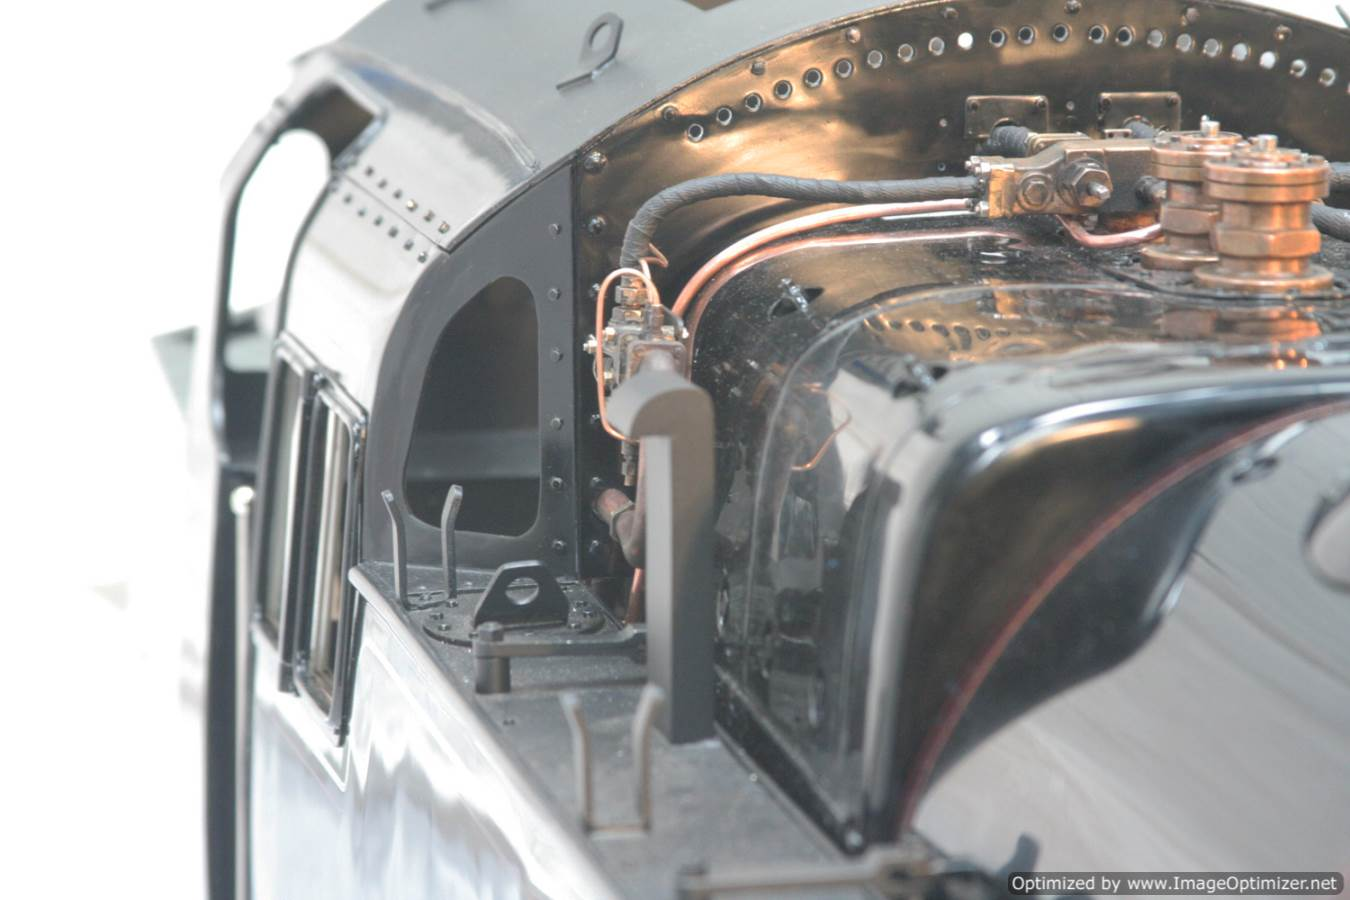 test br-standard-class-4-tank-live-steam-model-steam-workshop-rebuild-08-optimized